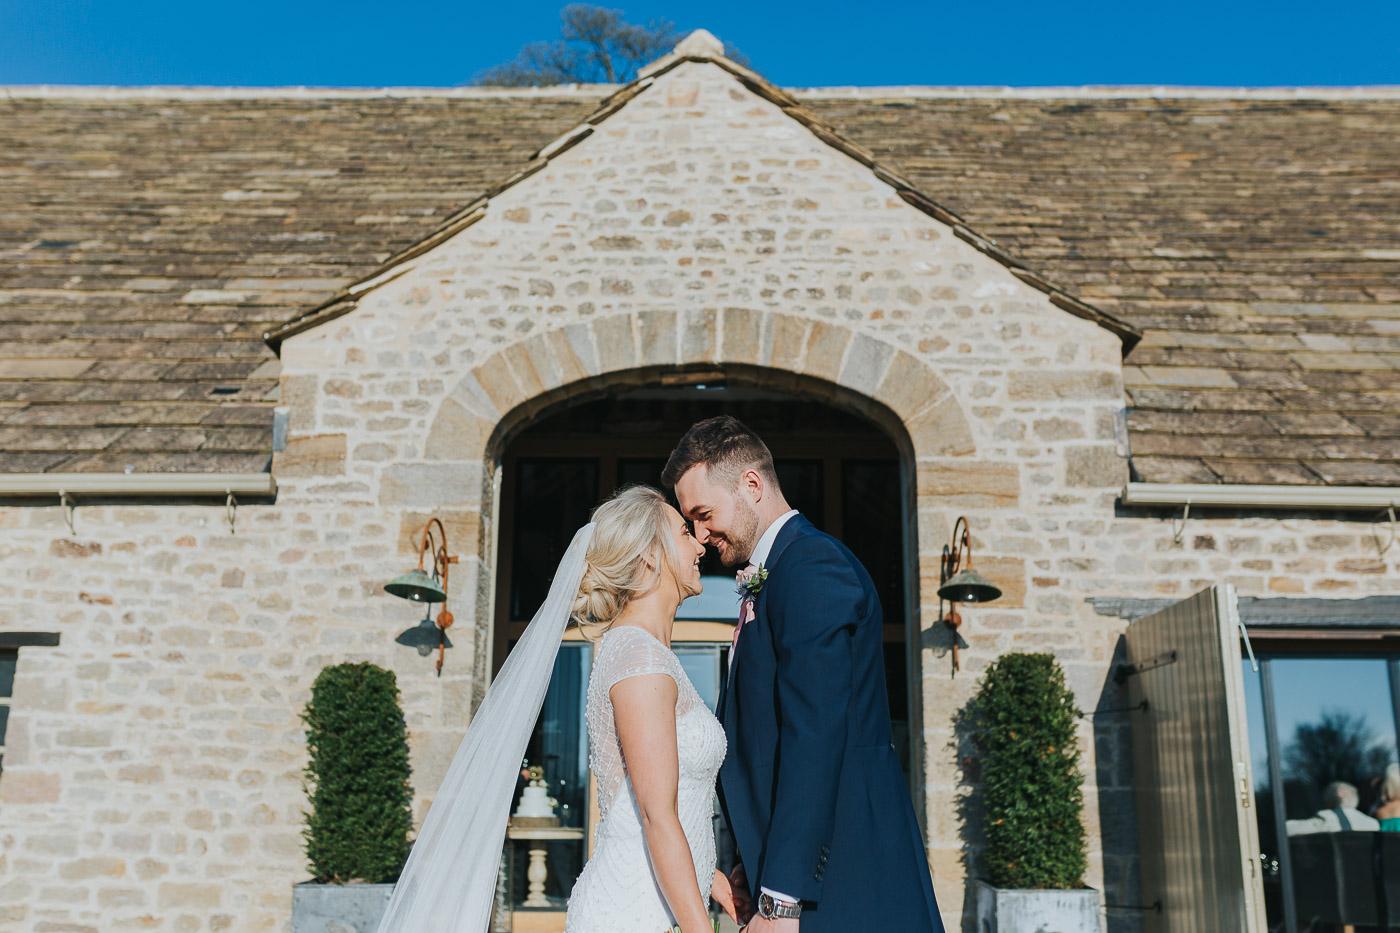 Tithe Barn - Laura Calderwood Photography - 29.3.19 - Mr & Mrs Lancaster290319-112.jpg